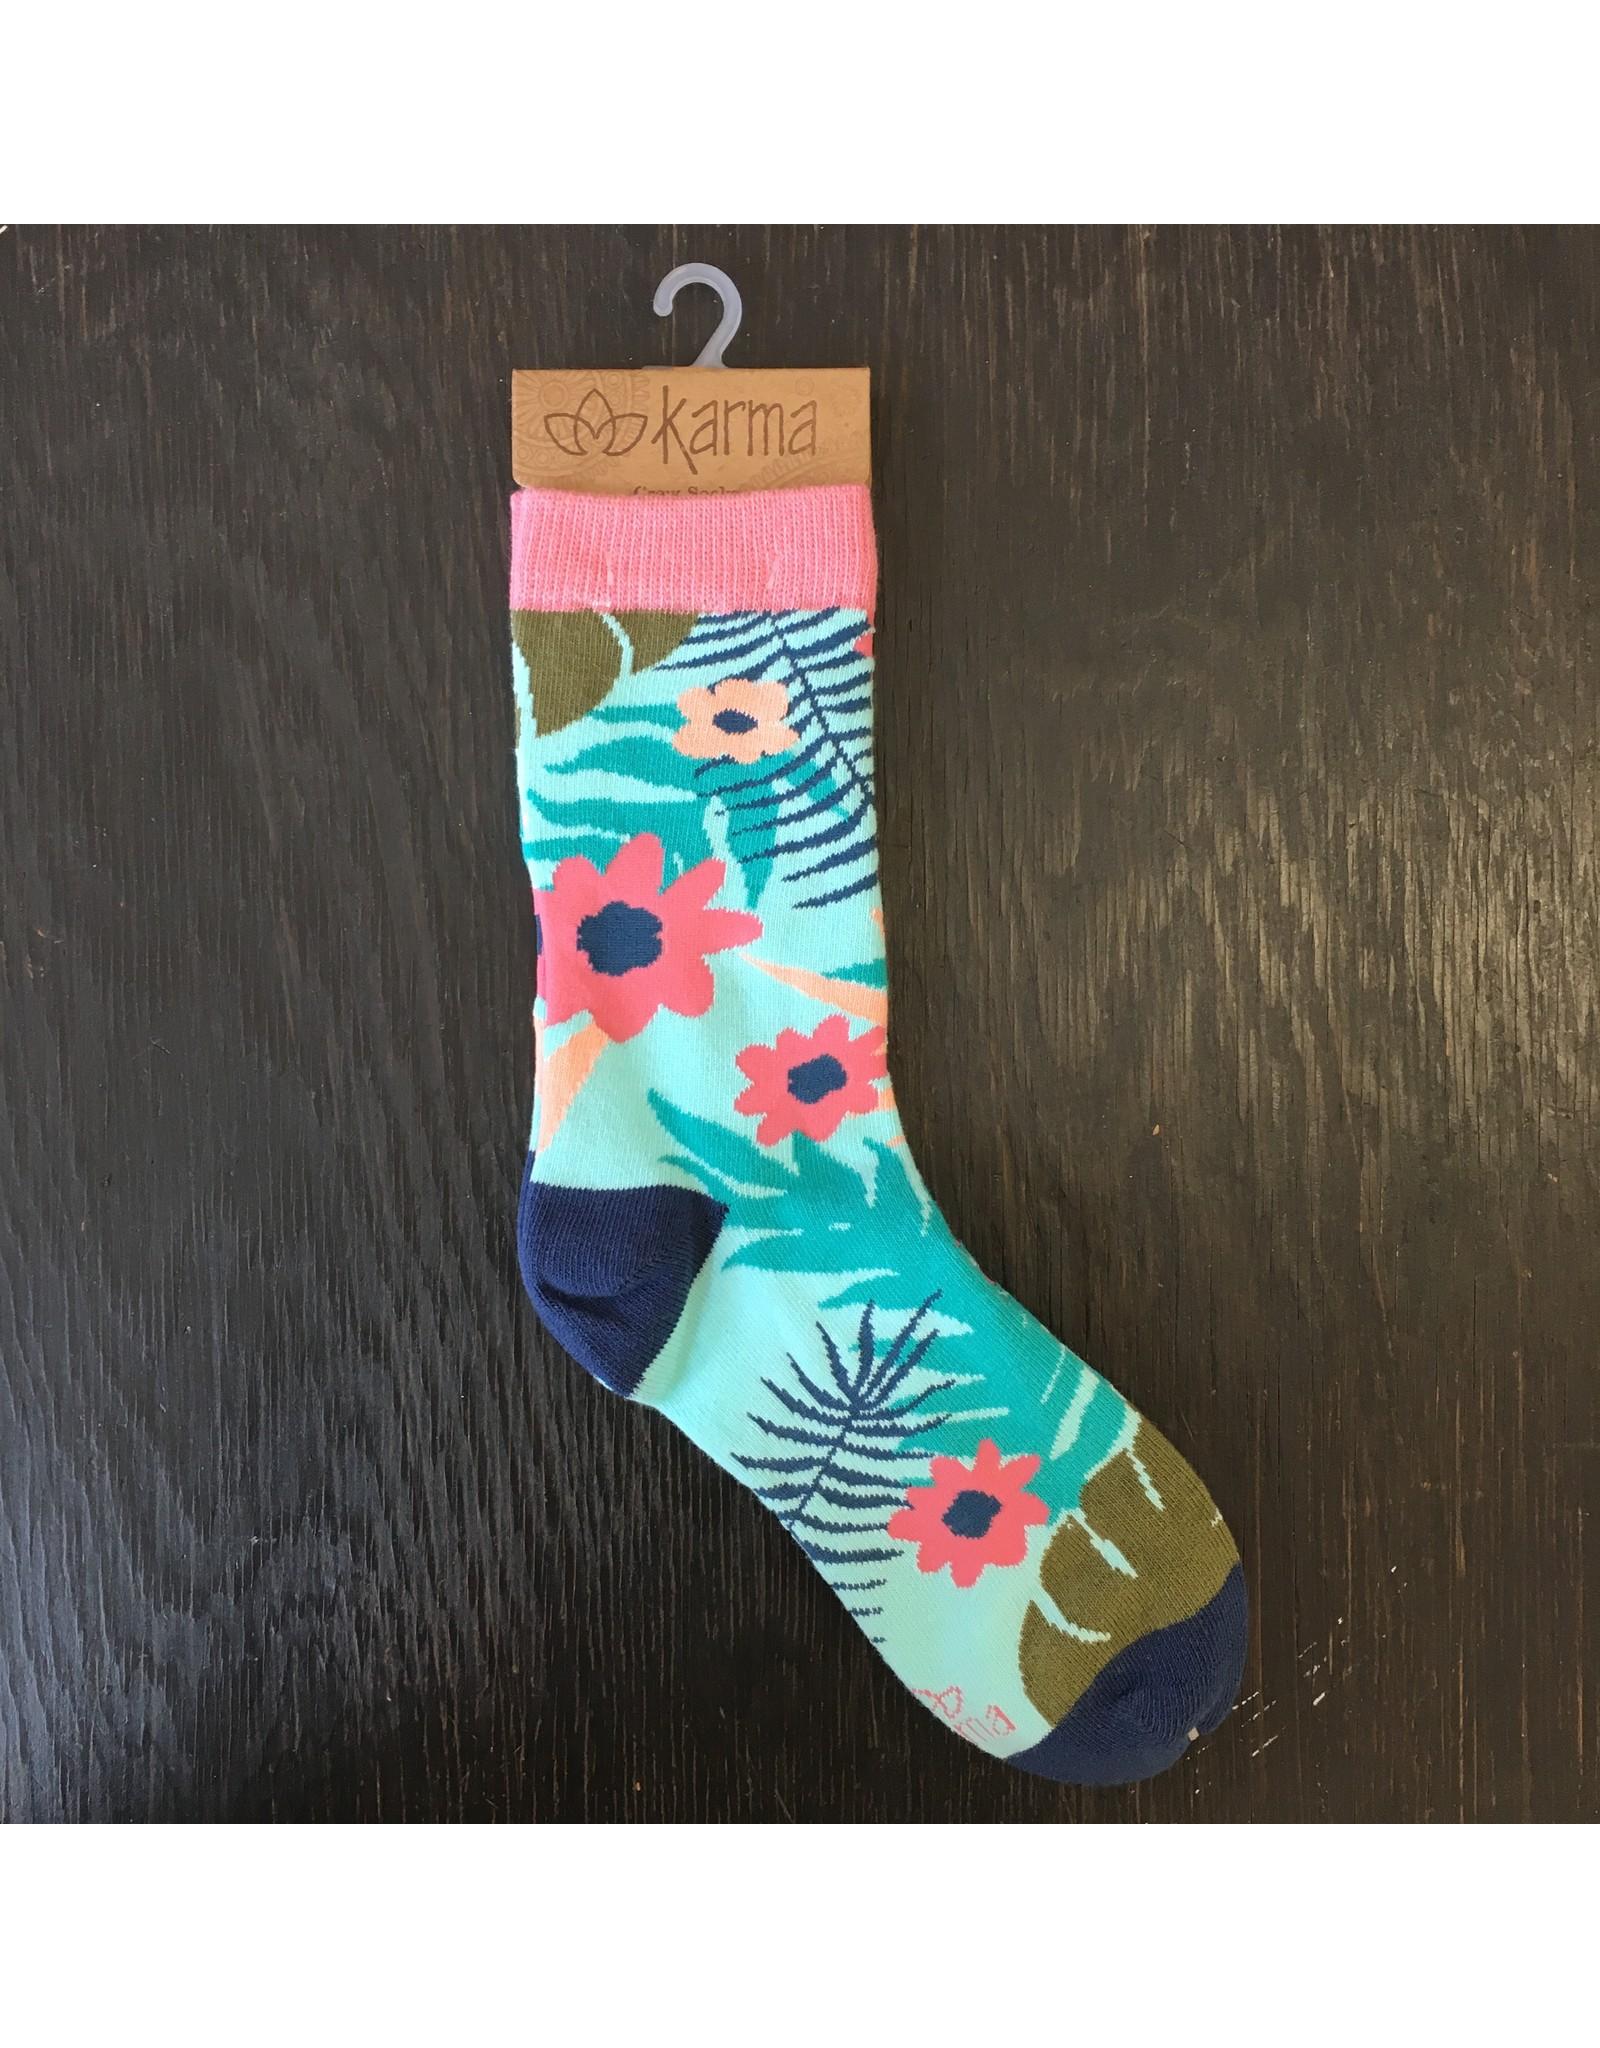 Lyla's: Clothing, Decor & More Aqua Floral Print Socks